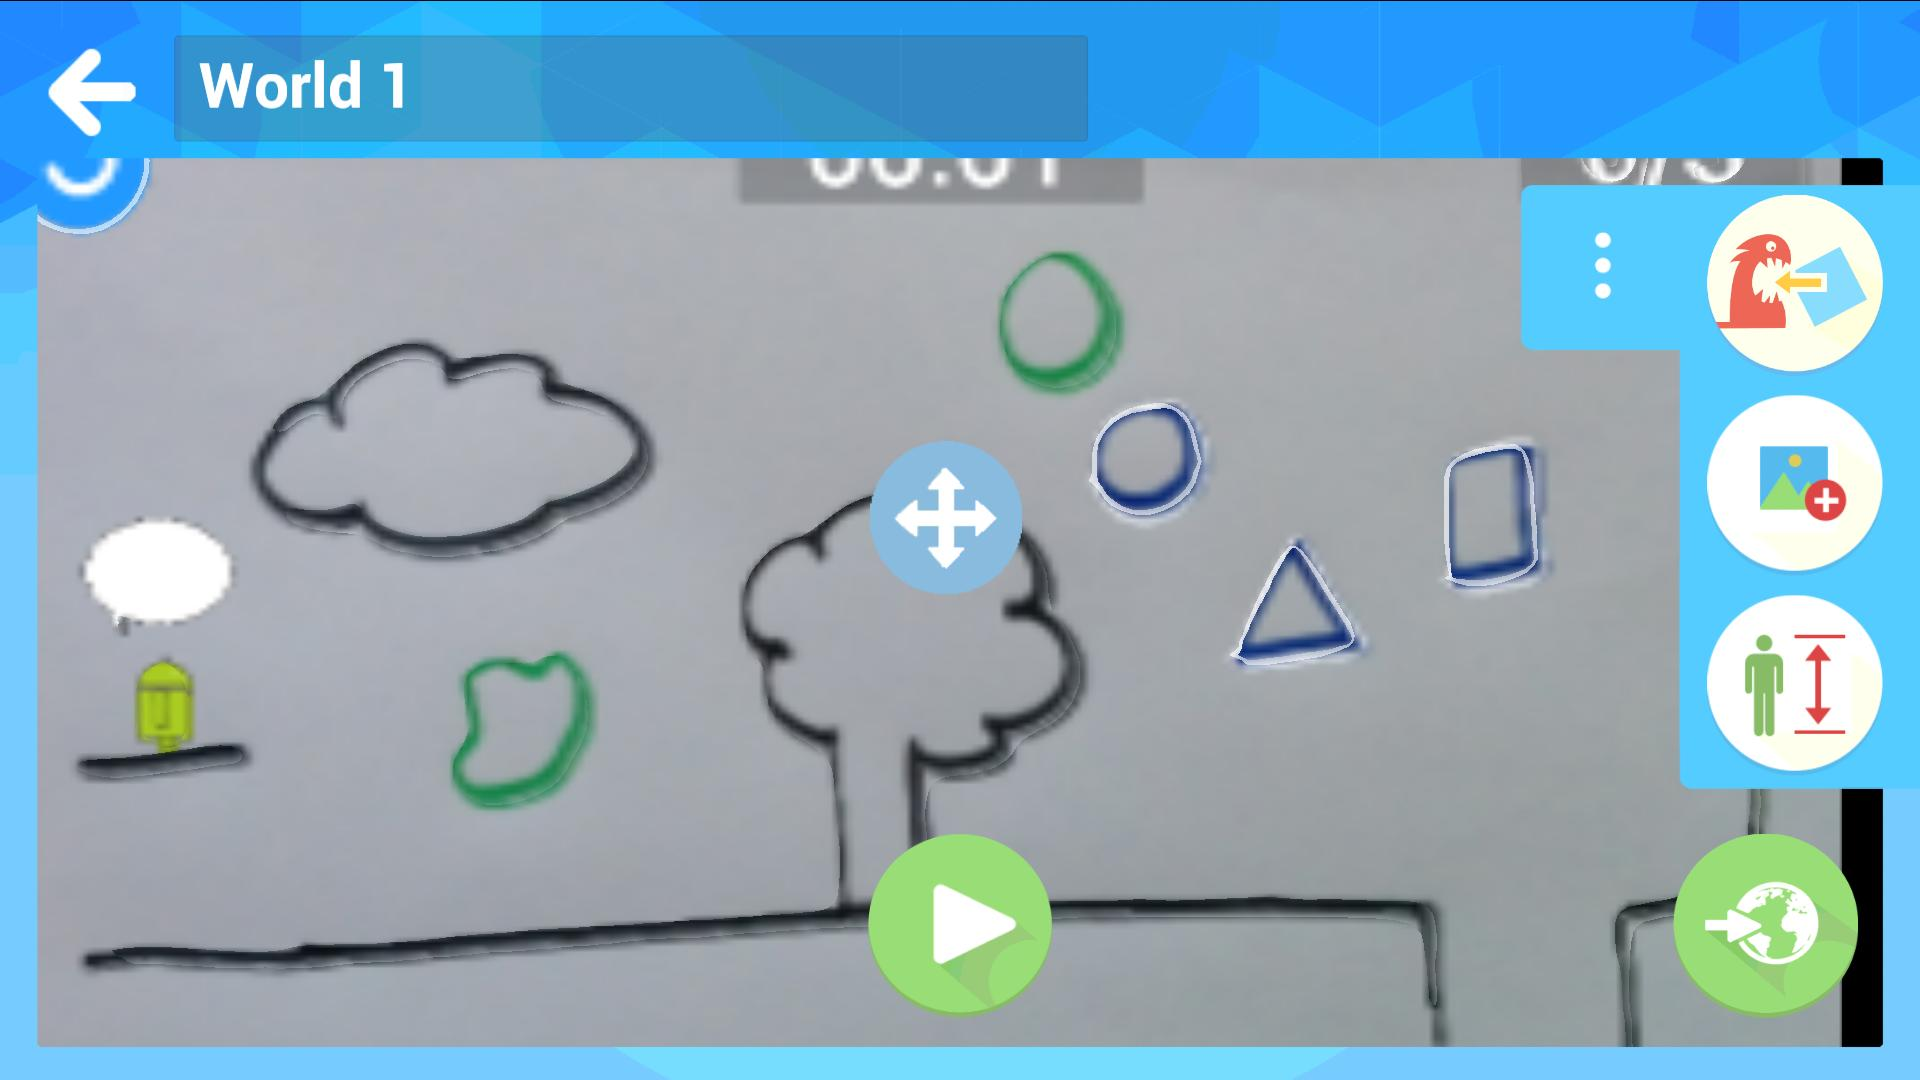 Kemudian-coba-klik-pada-tombol-play-yang-ada-di-tengah